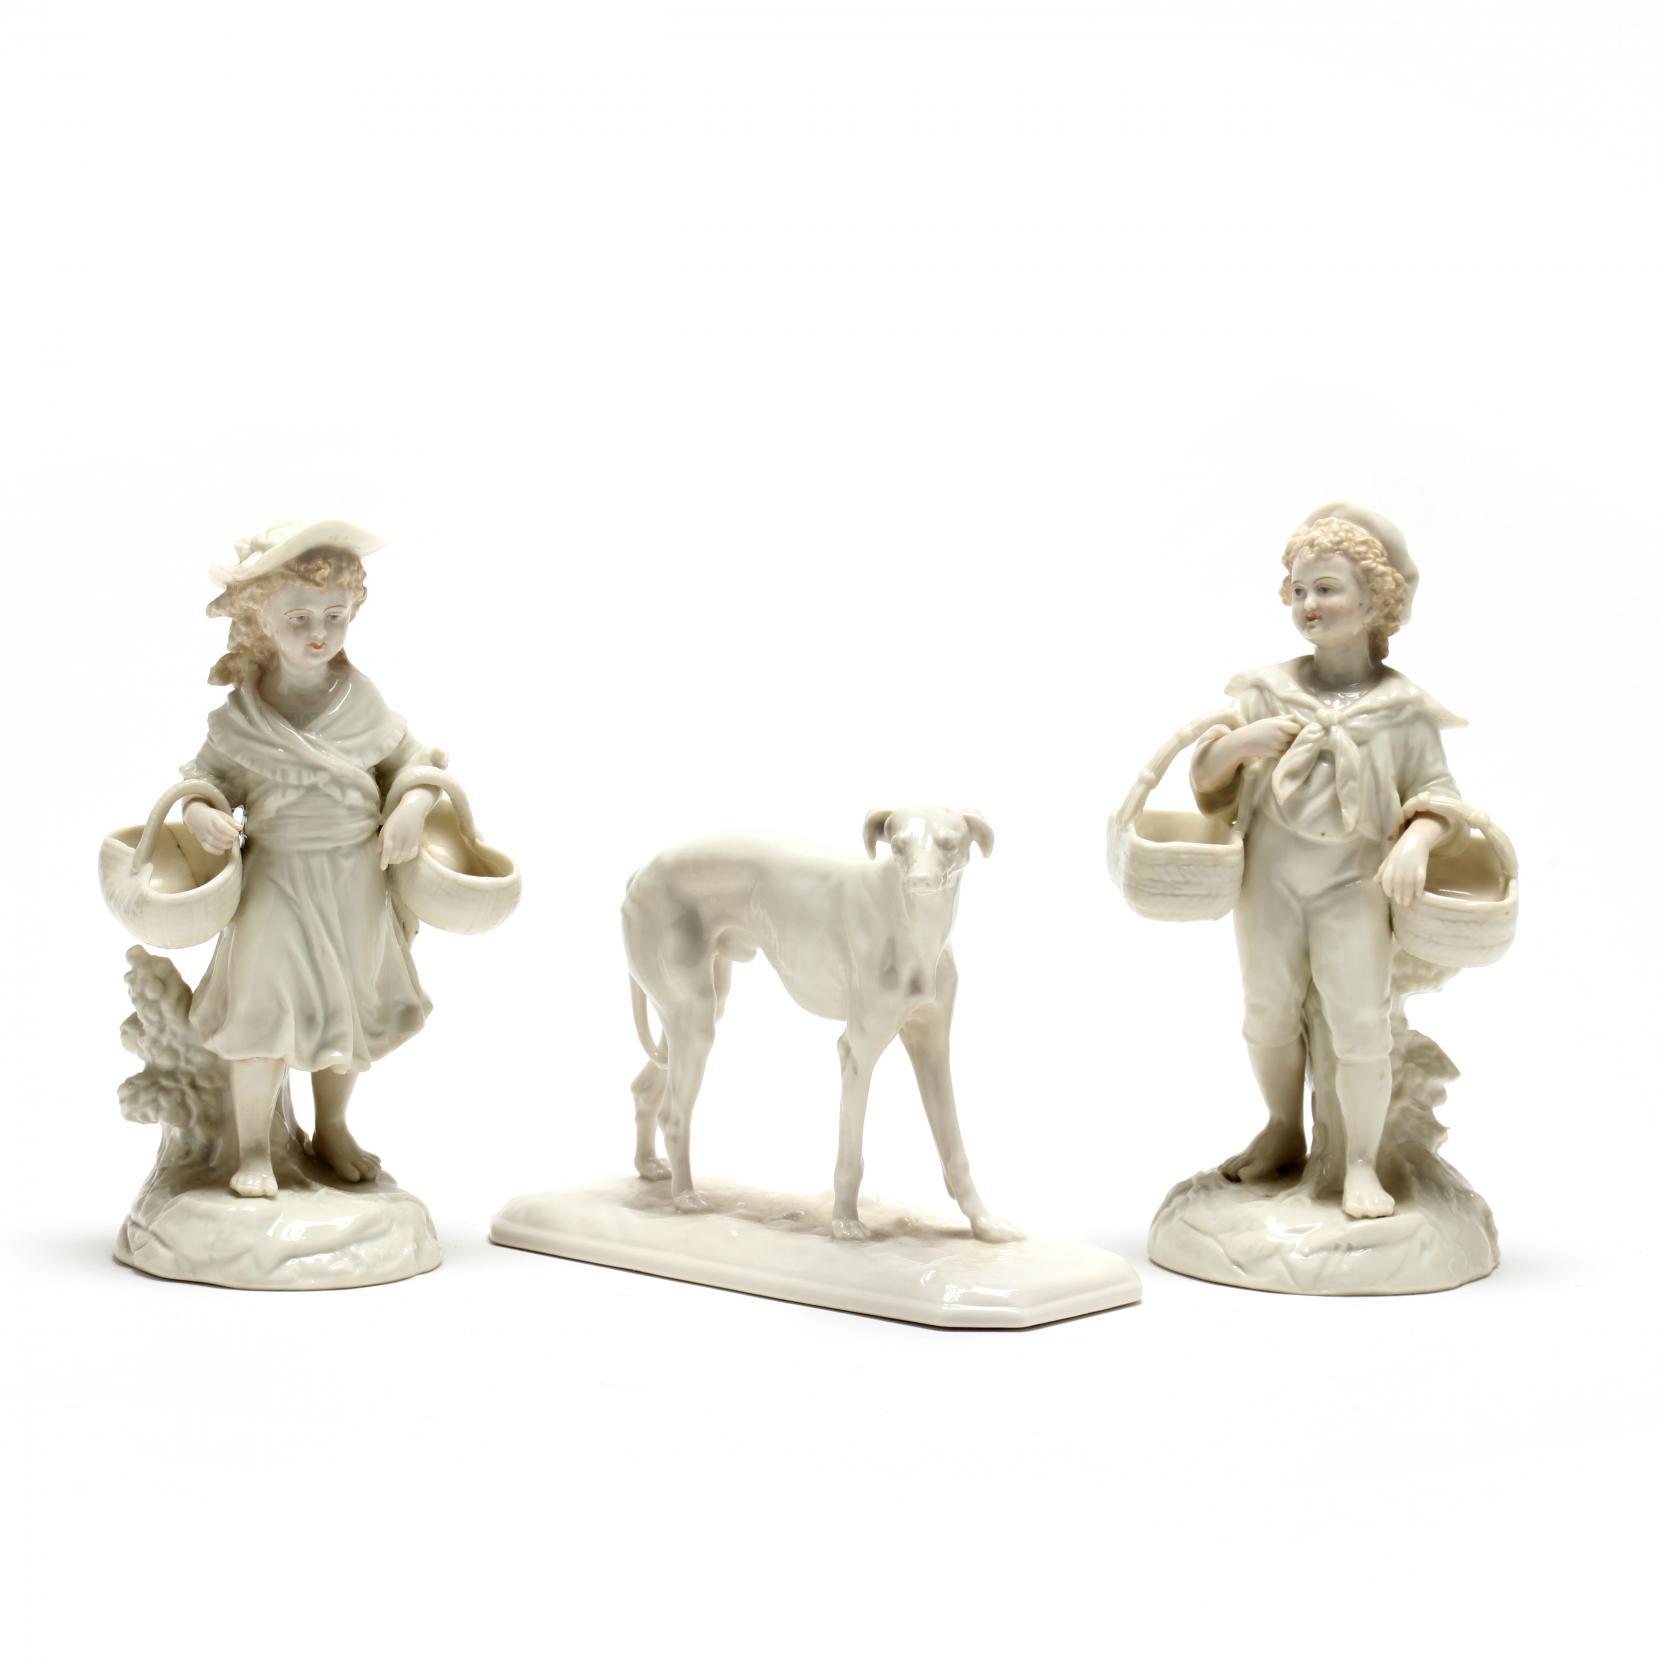 three-antique-continental-porcelain-figures